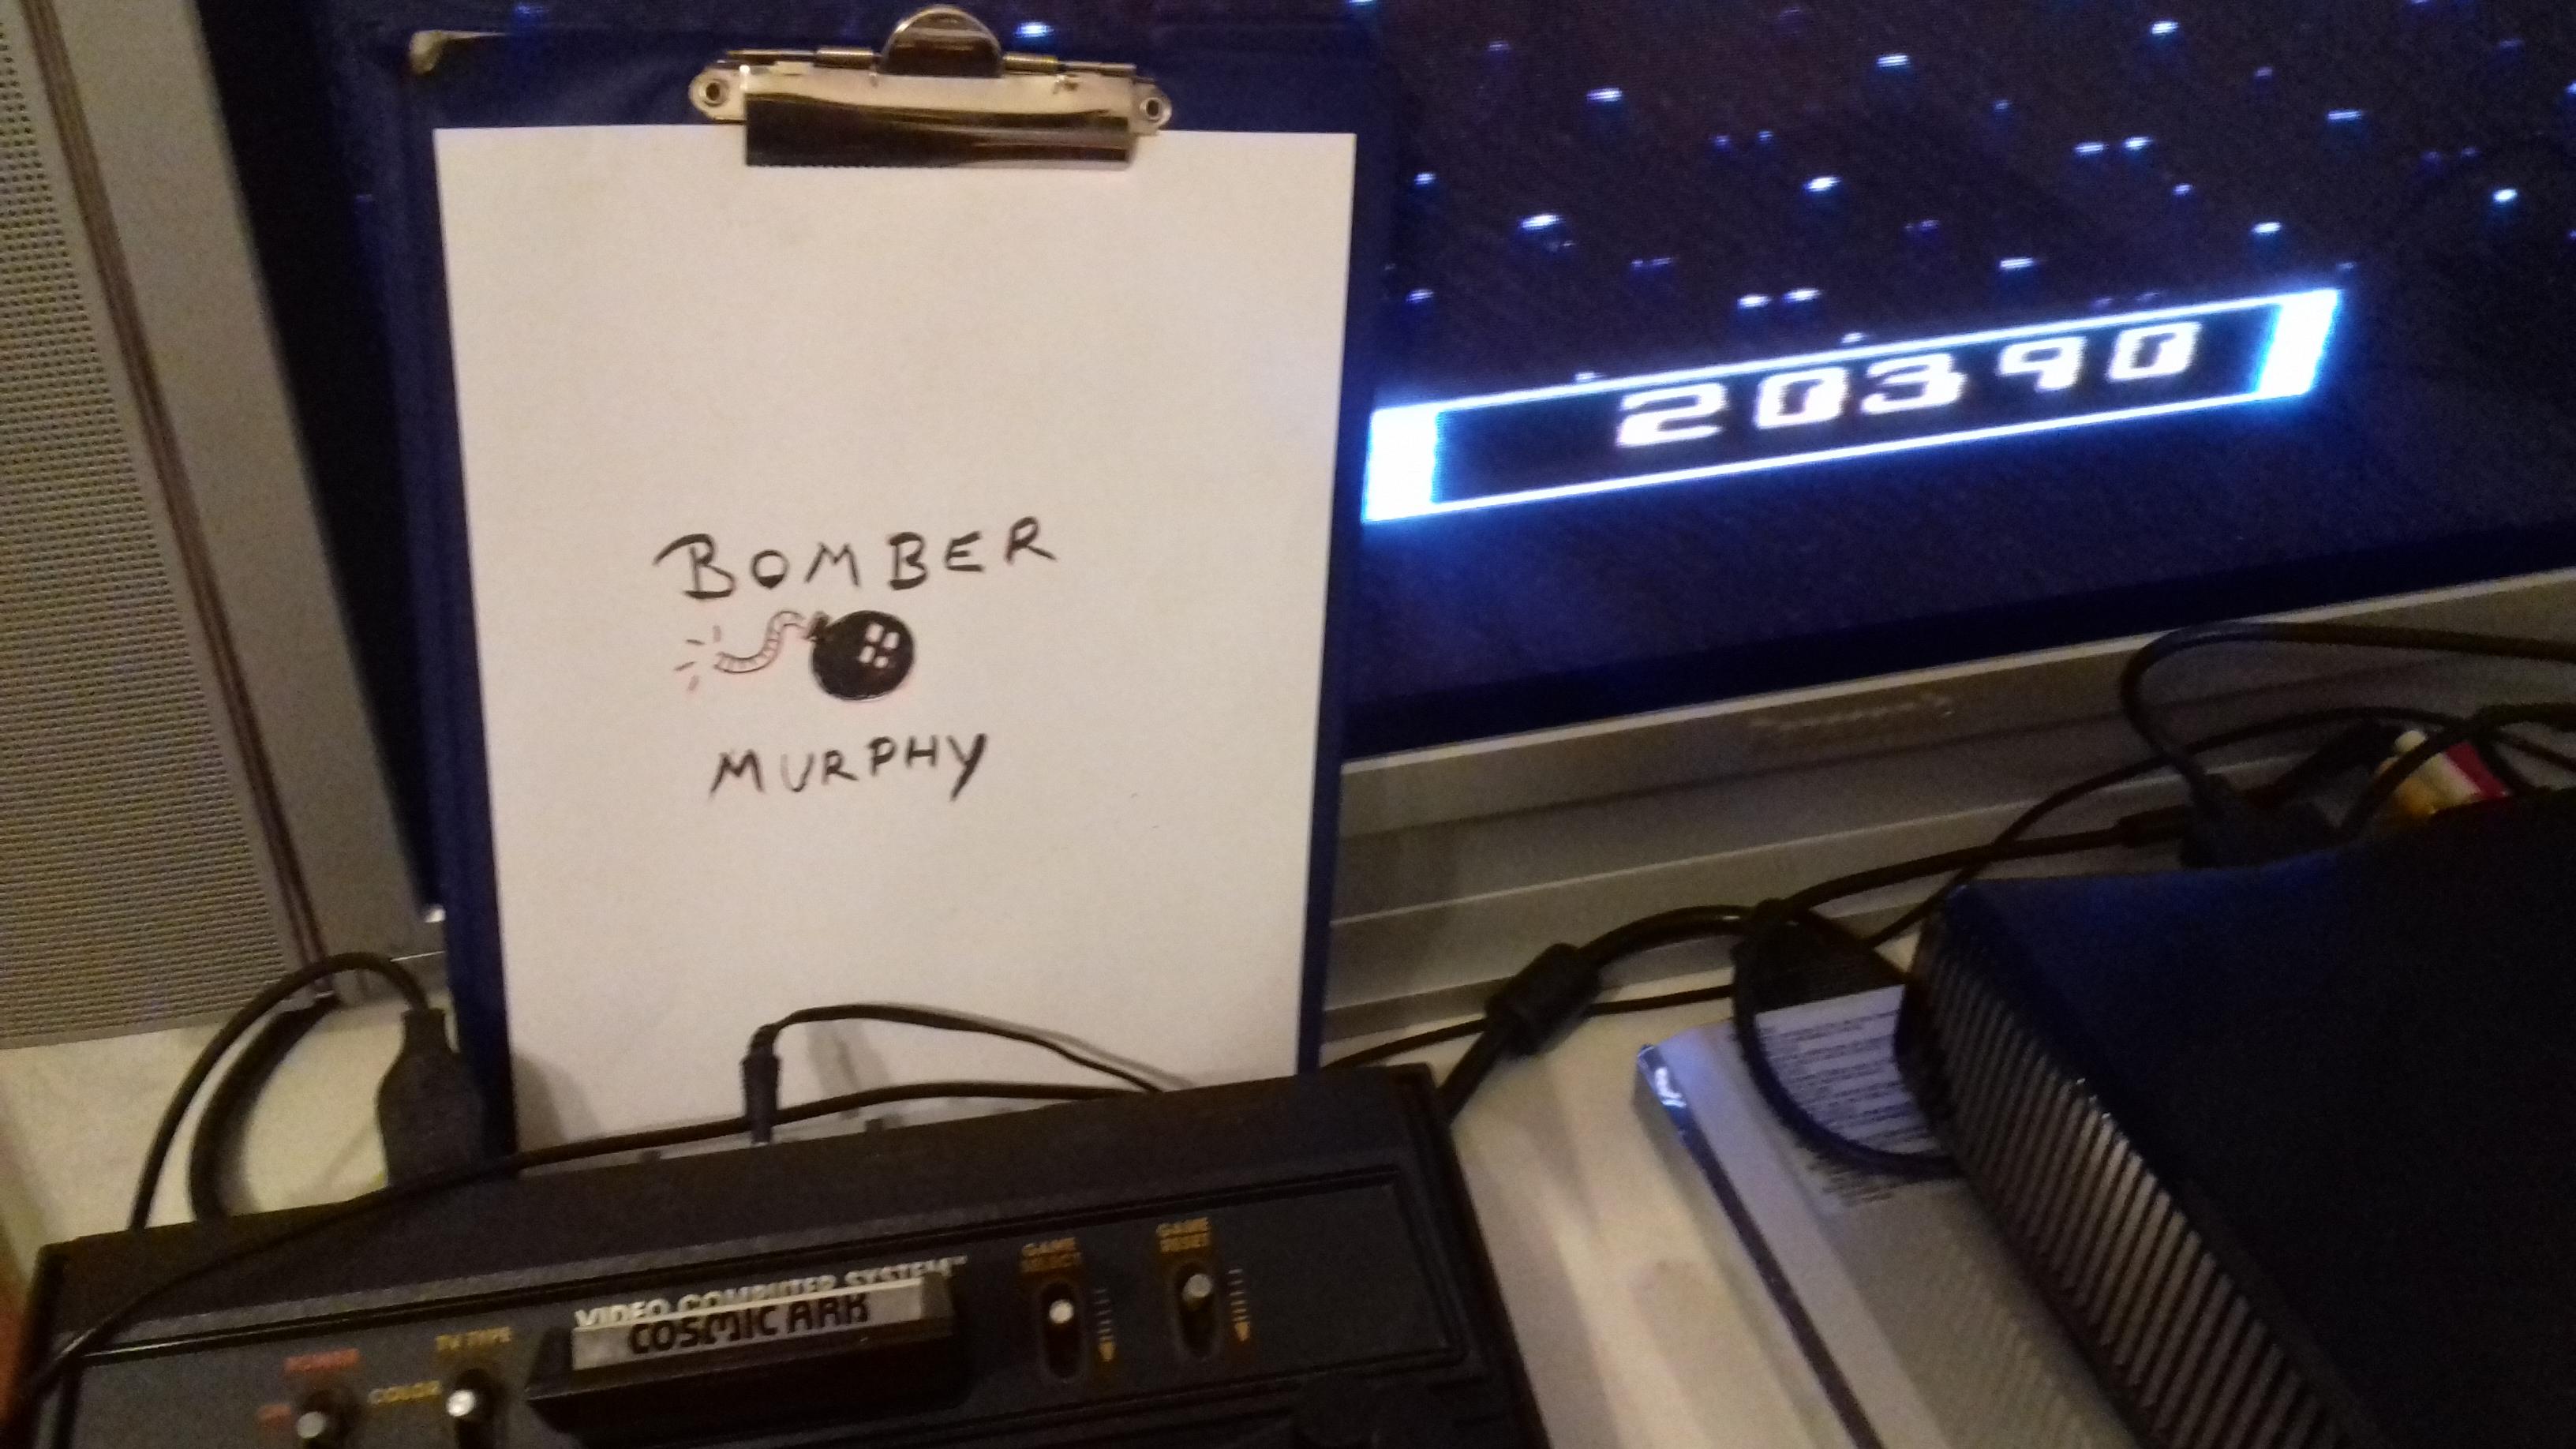 BomberMurphy: Cosmic Ark (Atari 2600 Novice/B) 20,390 points on 2018-02-27 15:26:41